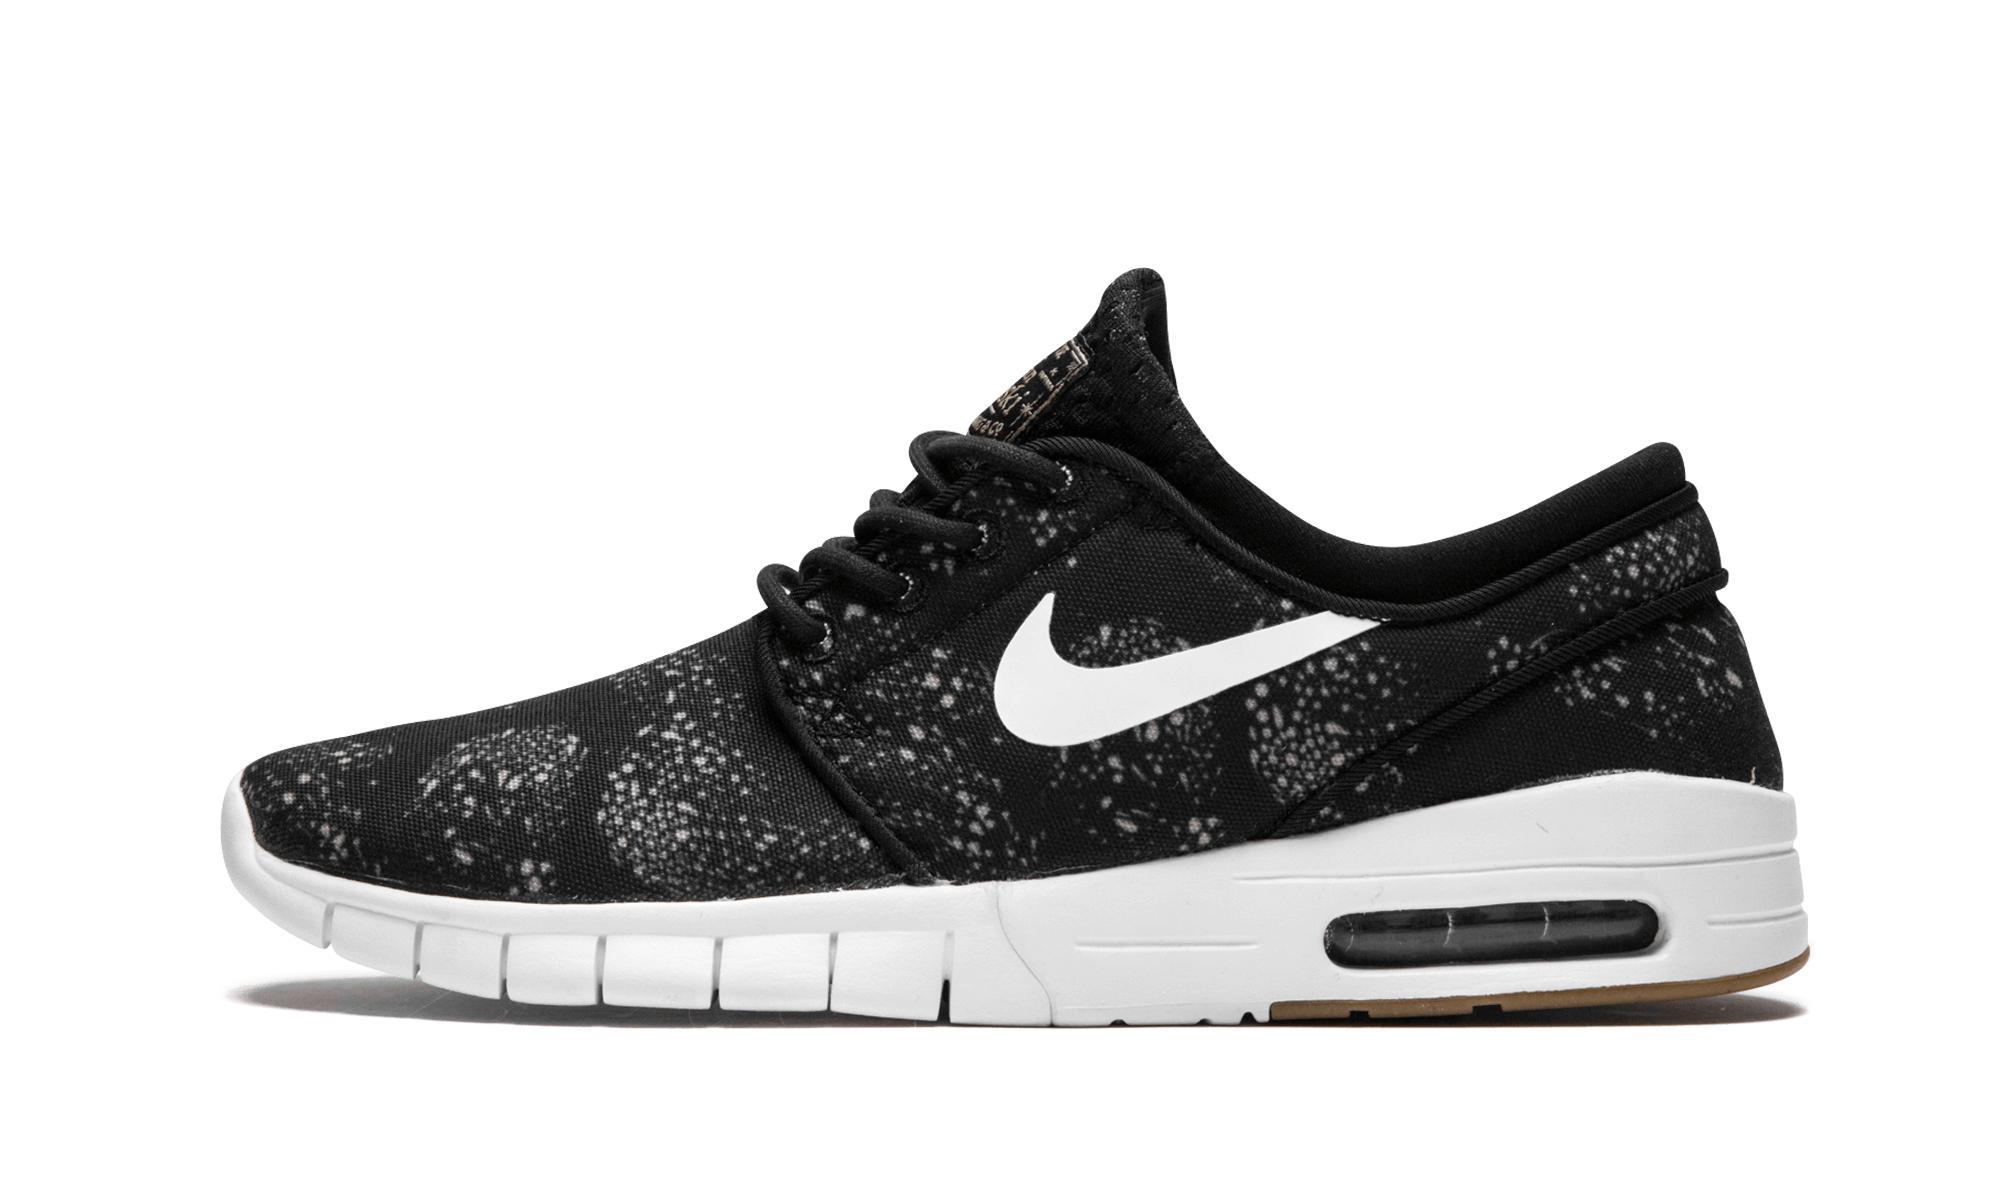 Lyst - Nike Stefan Janoski Max Prm Sneakers in Black for Men - Save ... 78d27951f